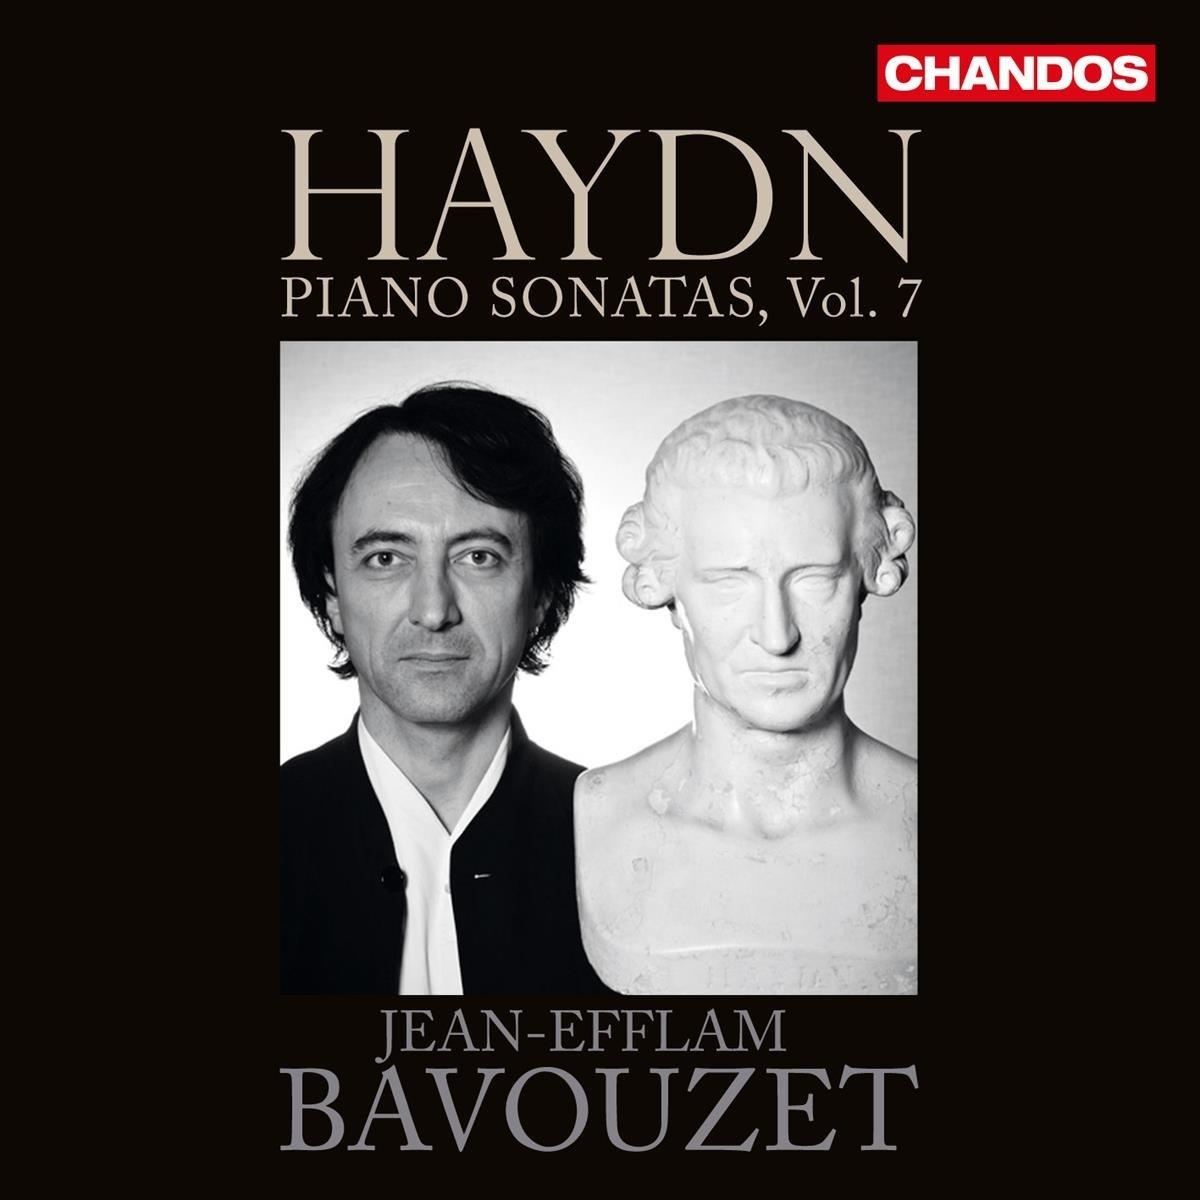 CD : Jean-Efflam Bavouzet - Piano Sonatas 7 (CD)